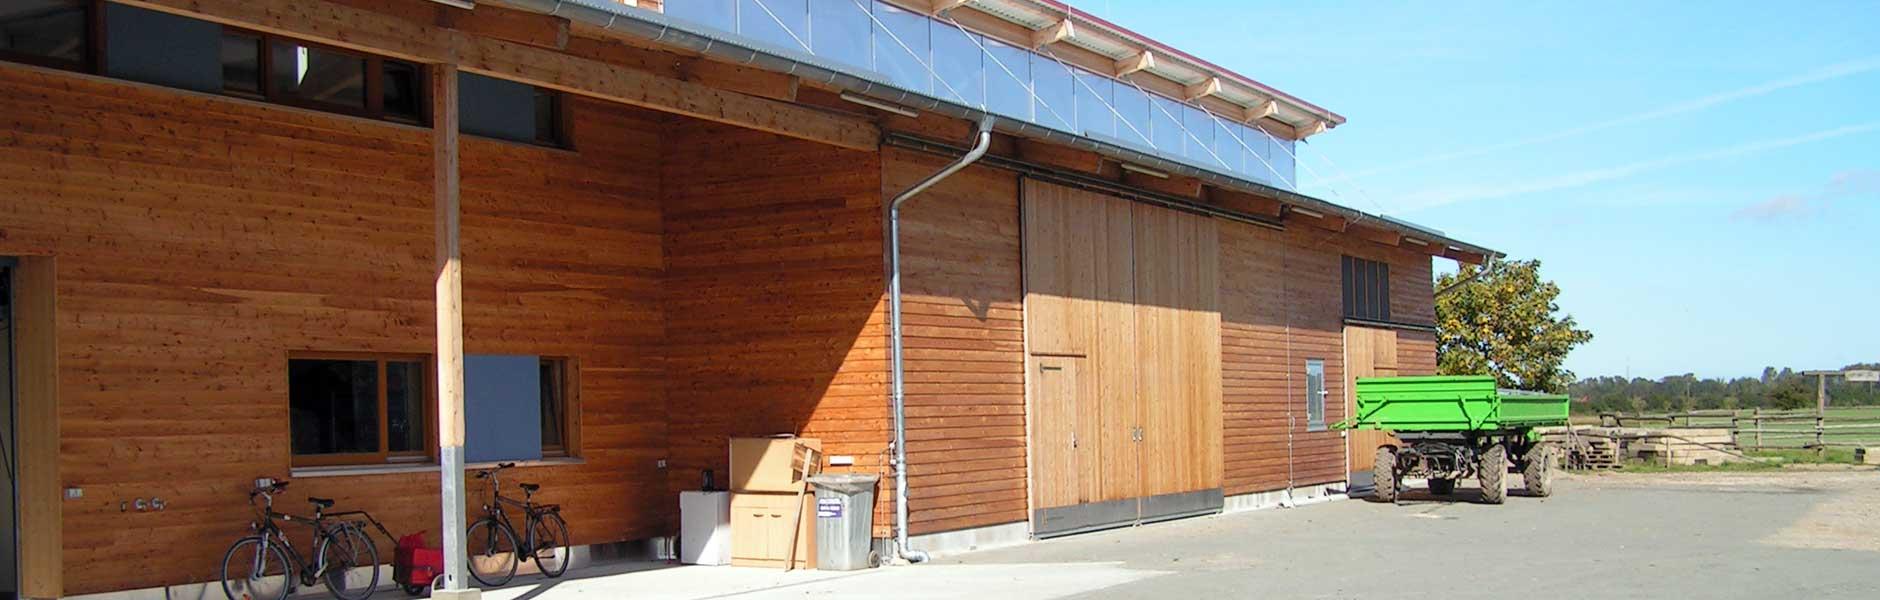 Neubau Dorfmeisterei im SOS-Kinderdorf Grimmen